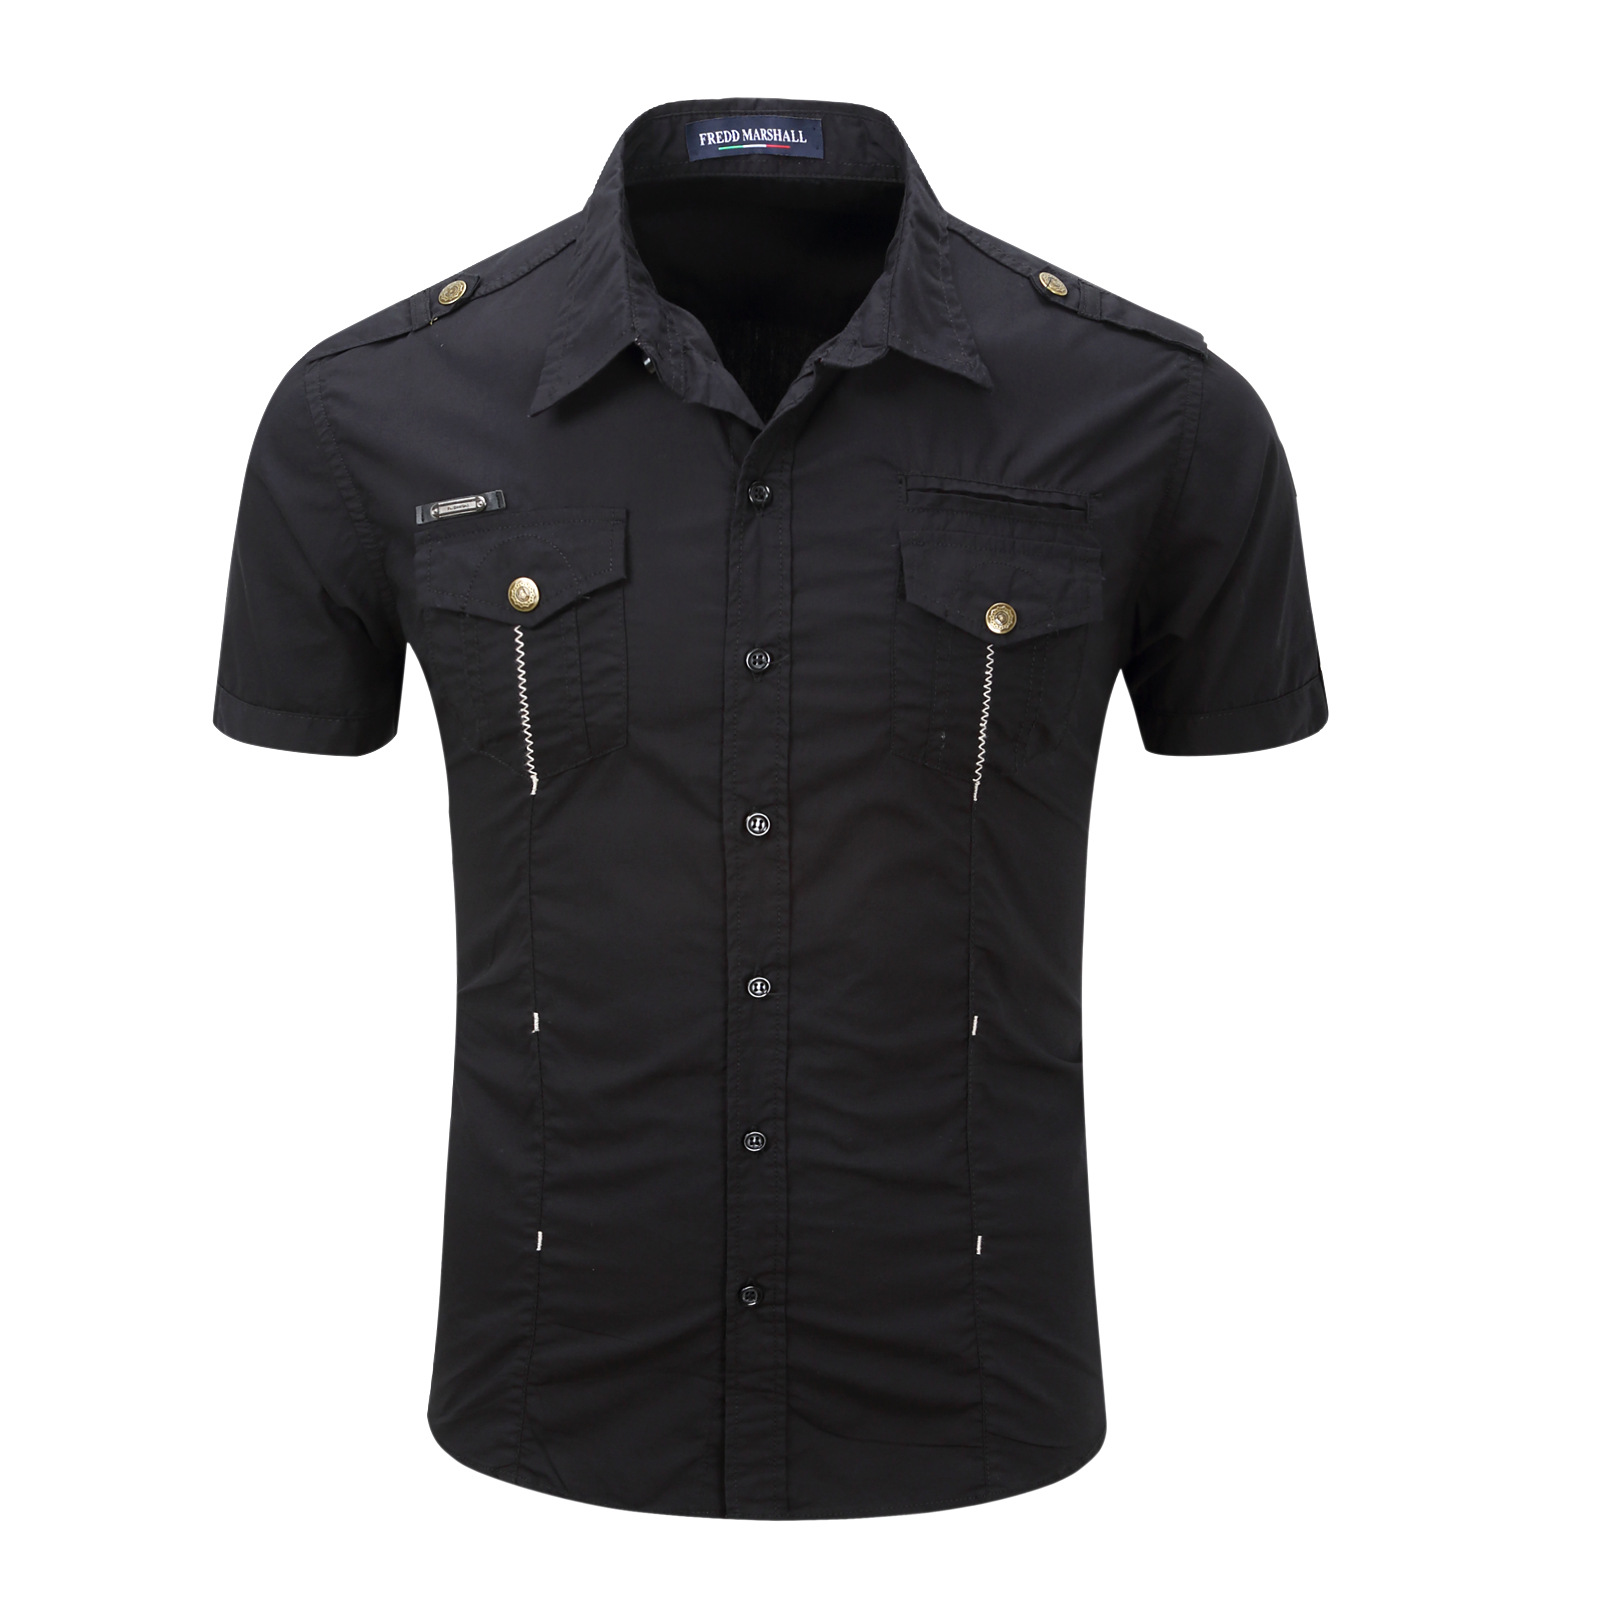 TREVOR LEIDEN Men Shirt military Mens short Sleeve Slim fitness camisa masculina Khaki Shirt High Quality Shirt men Clothes